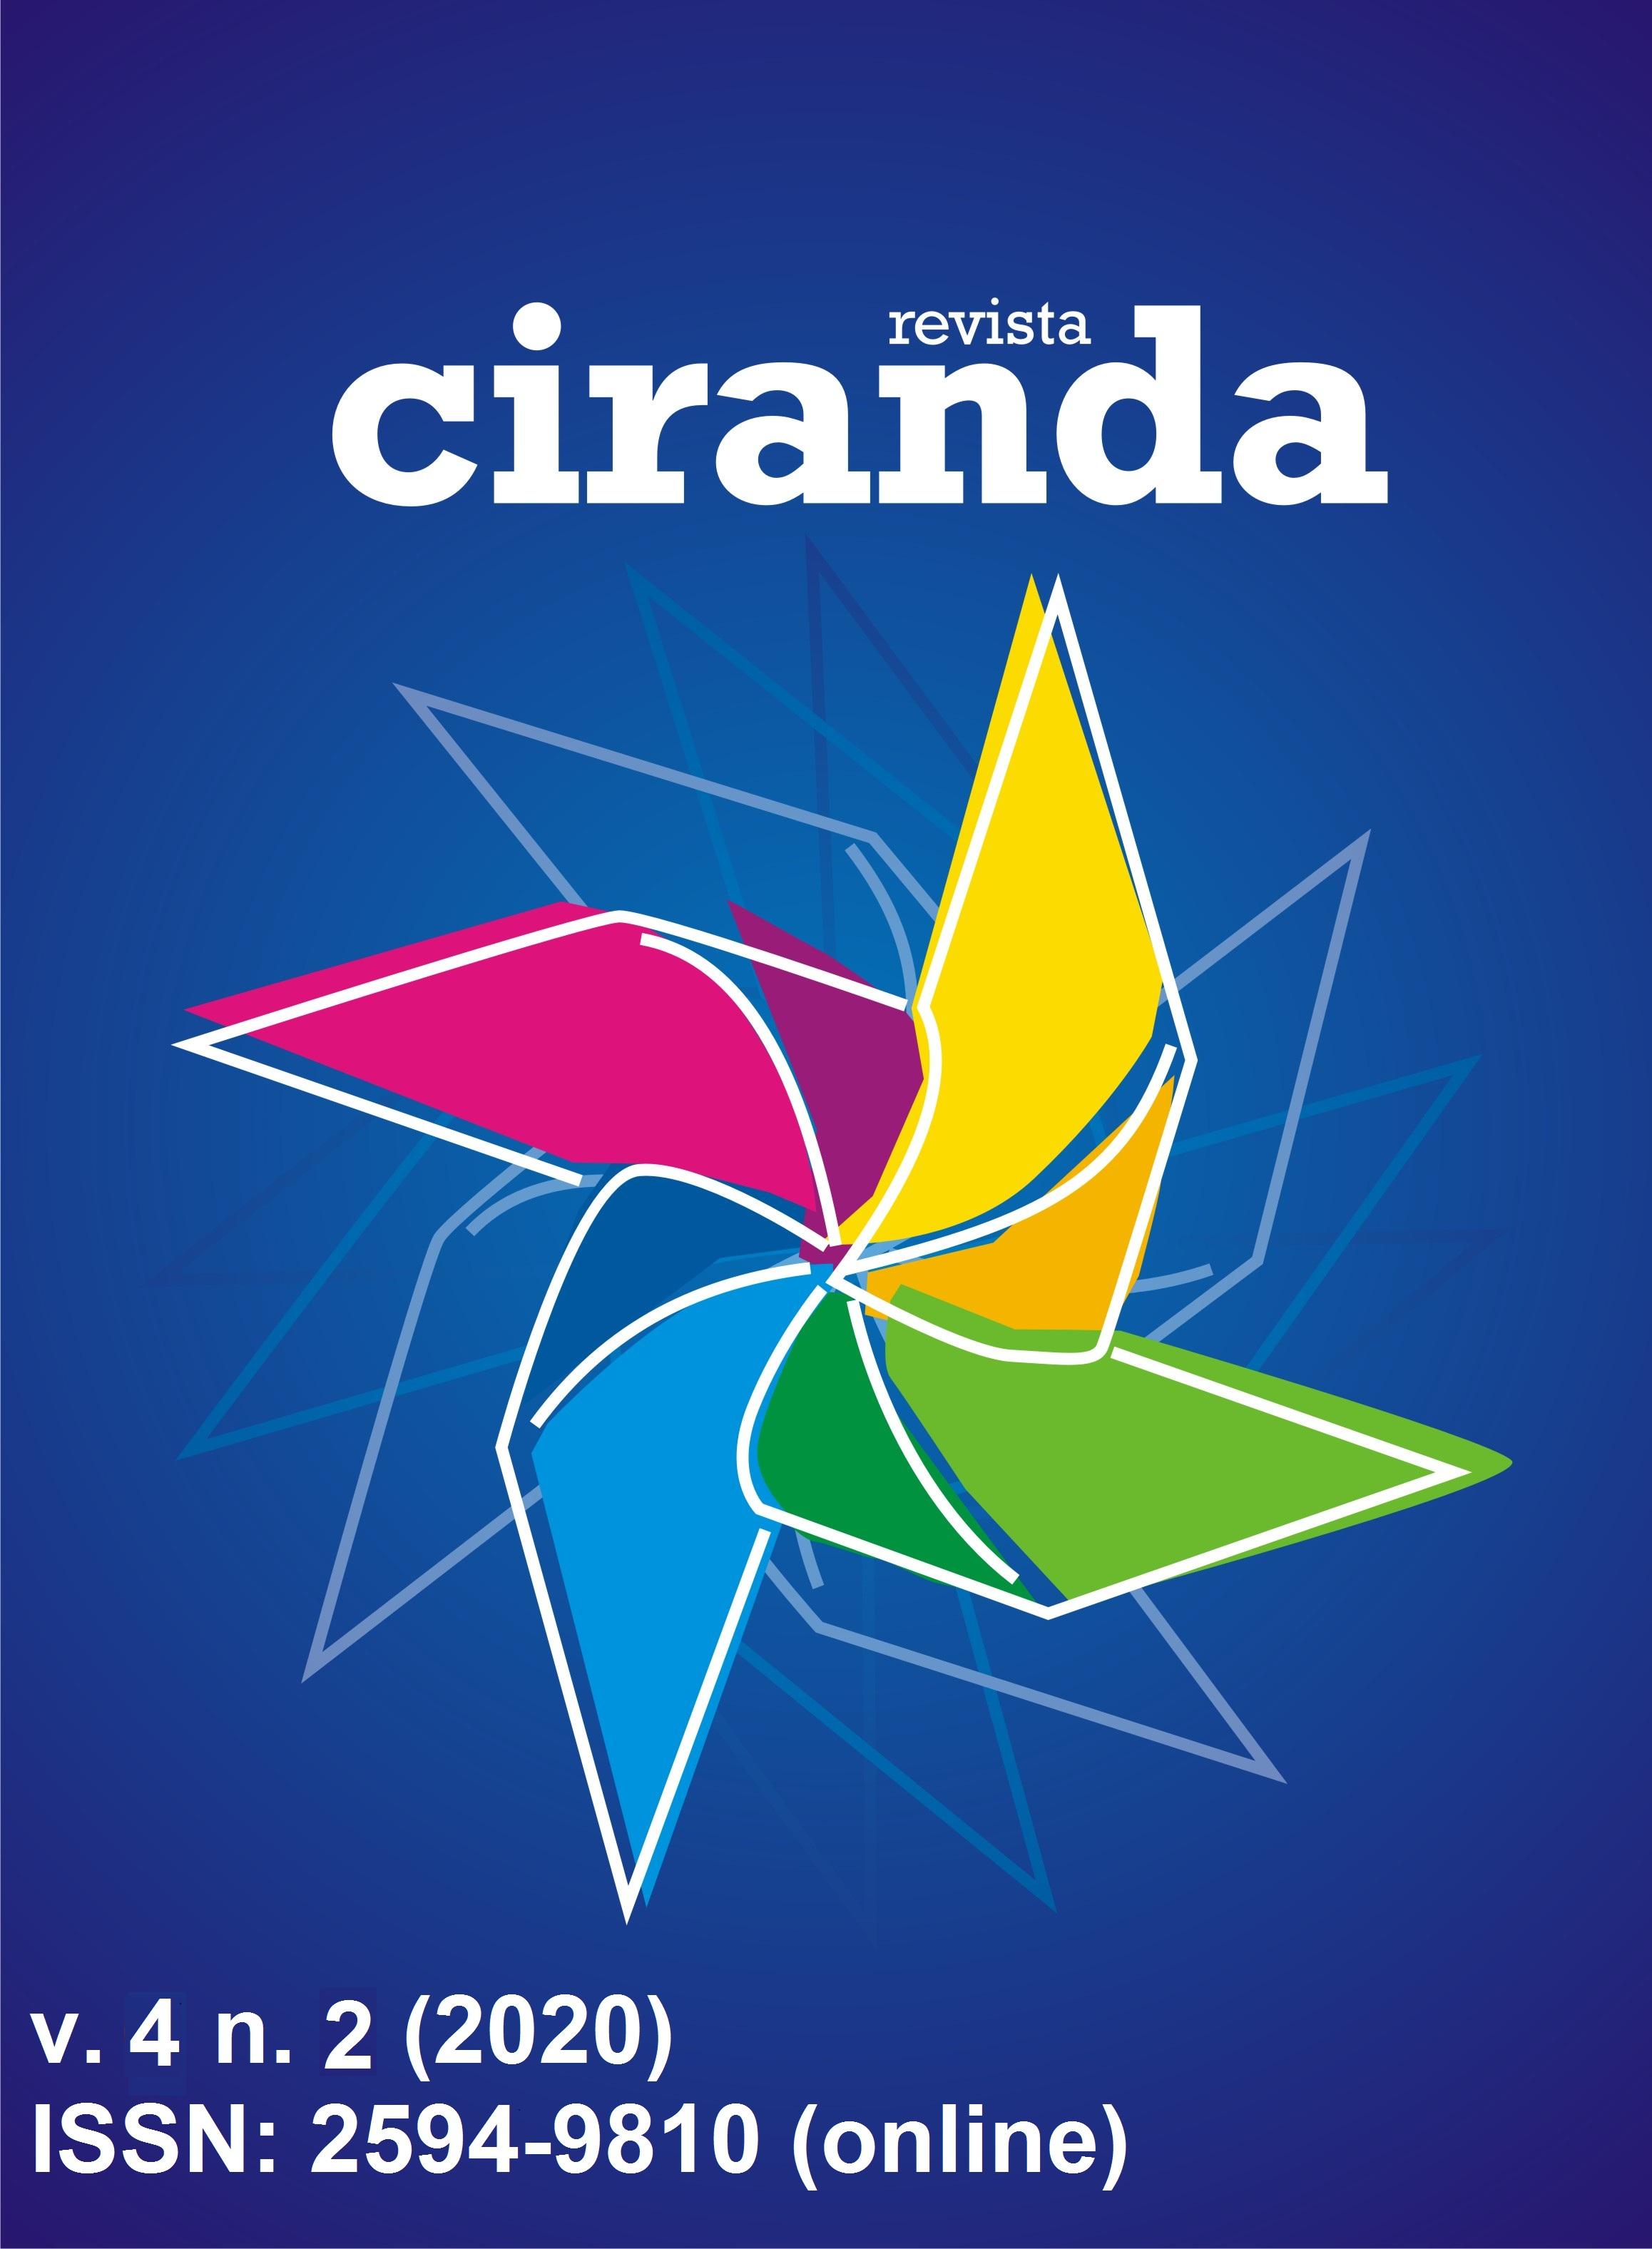 Visualizar v. 4 n. 2 (2020): Revista Ciranda